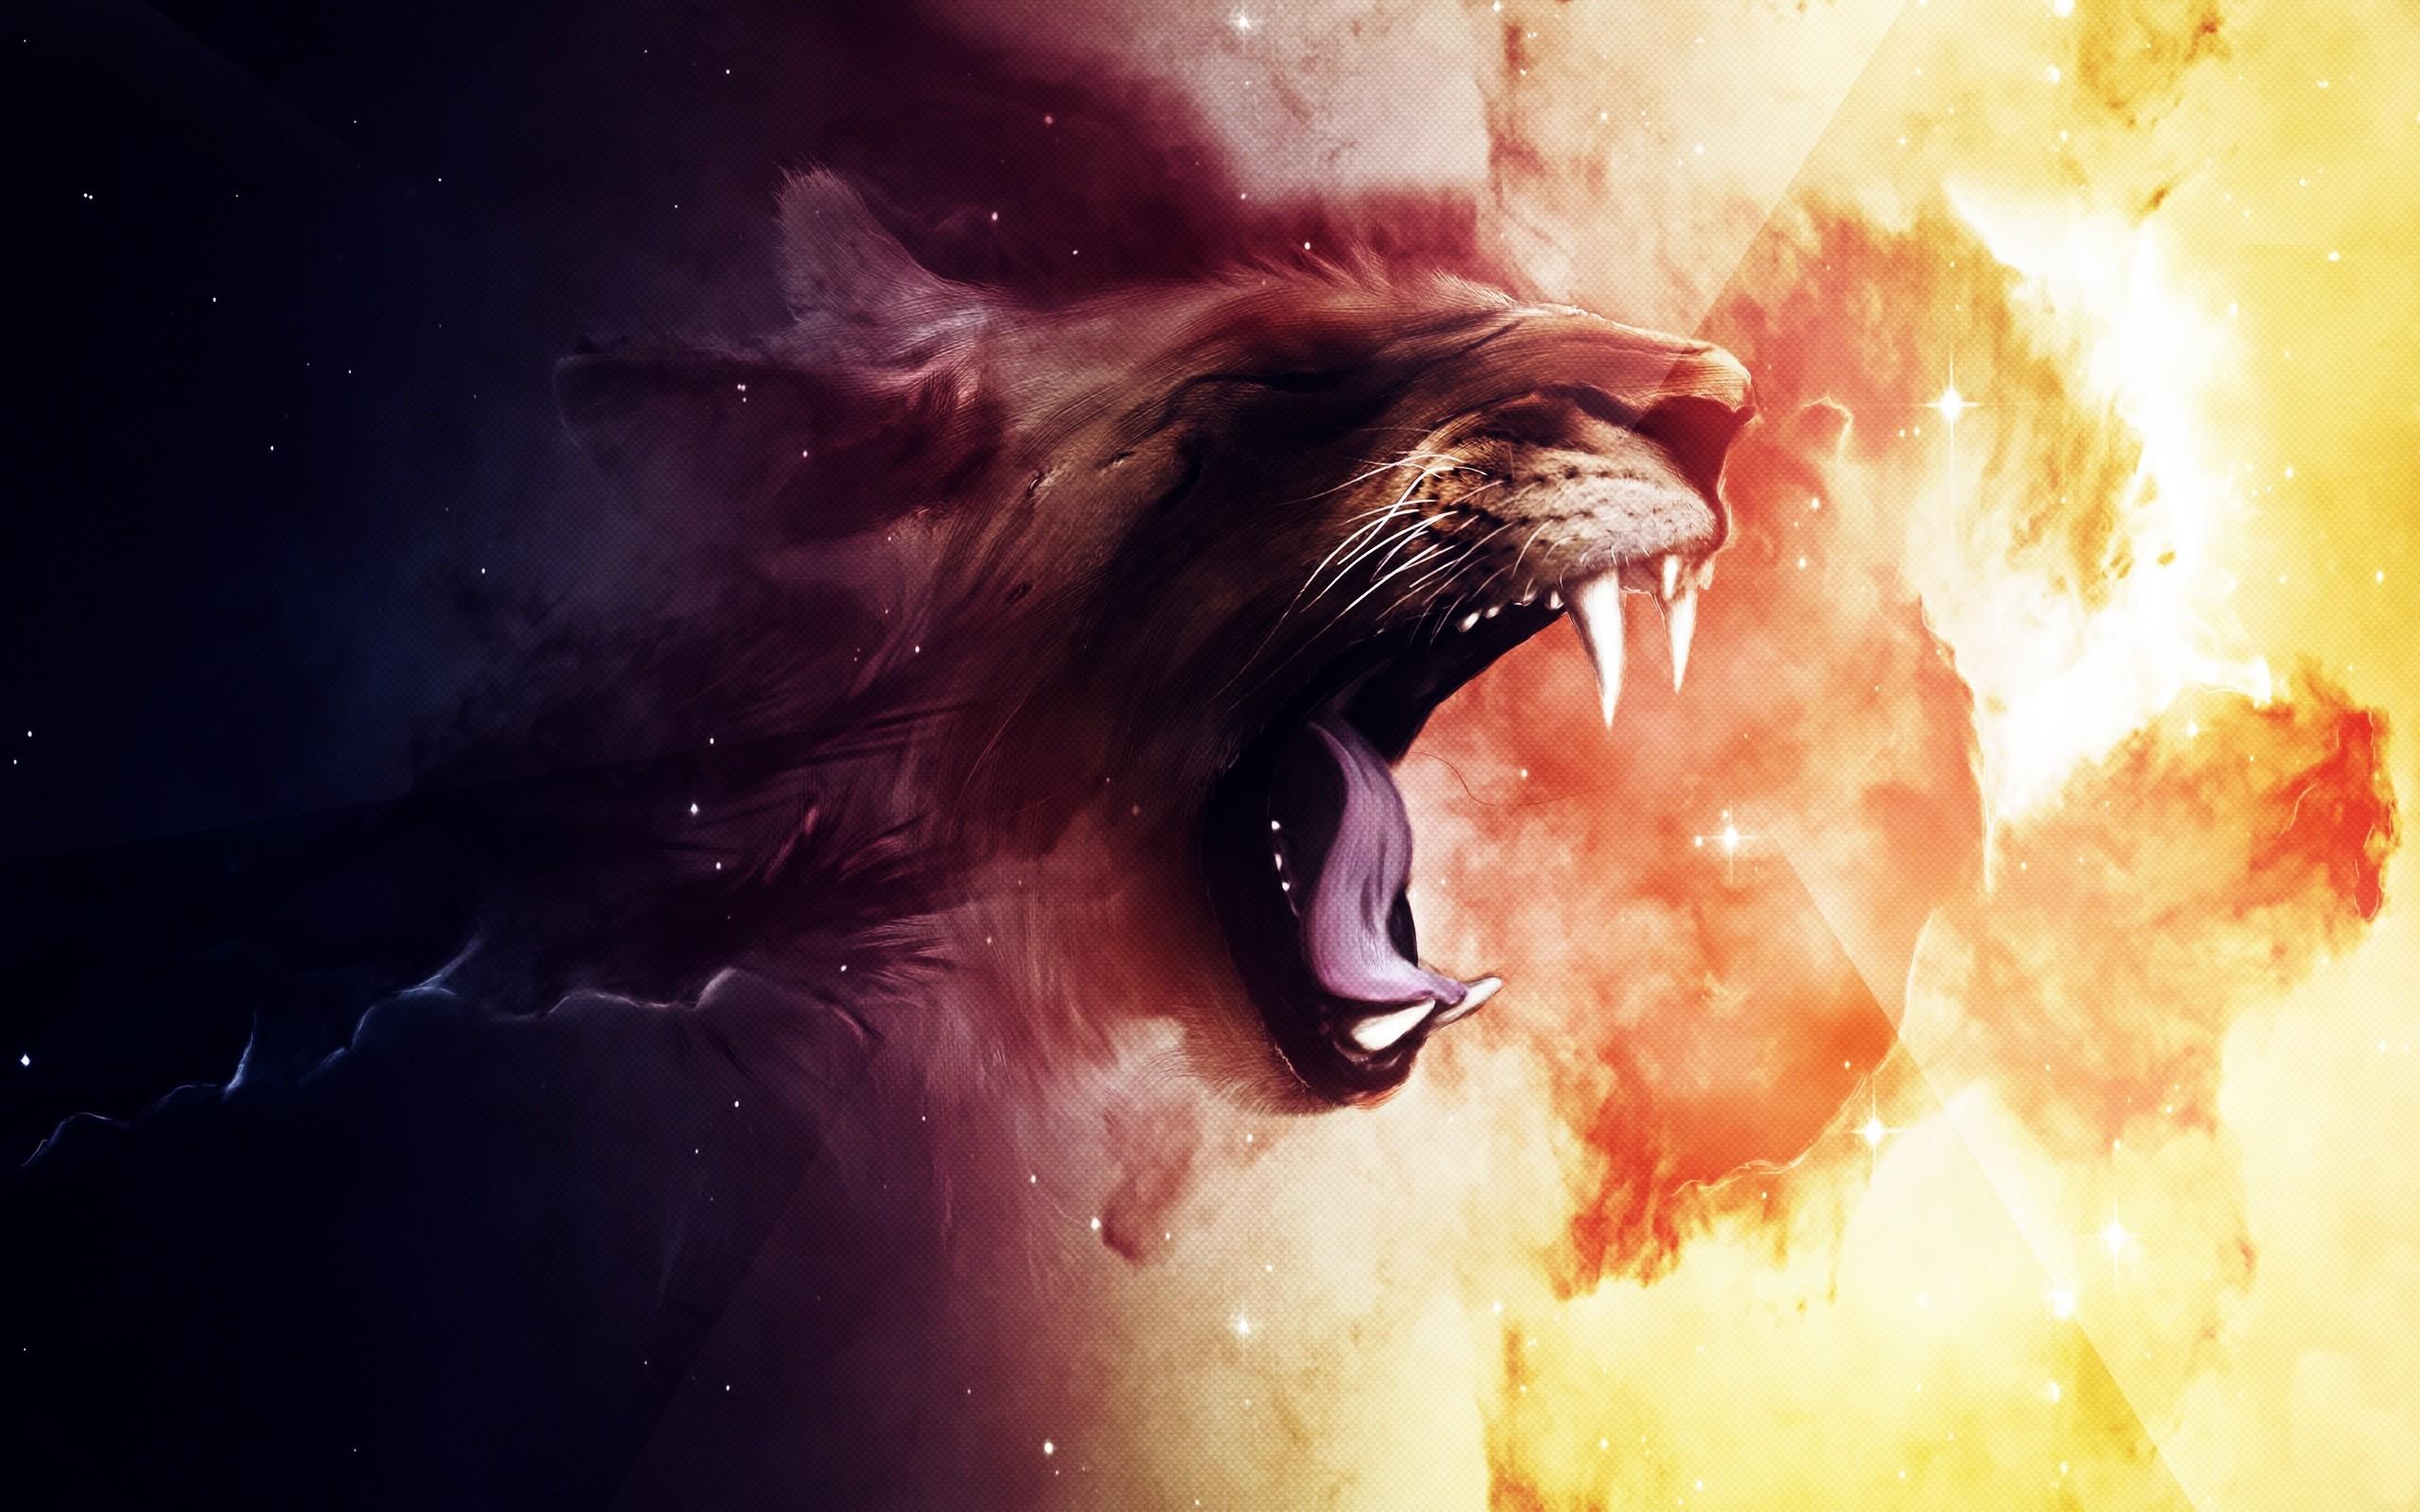 Roaring Lion Wallpapers | HD Wallpapers